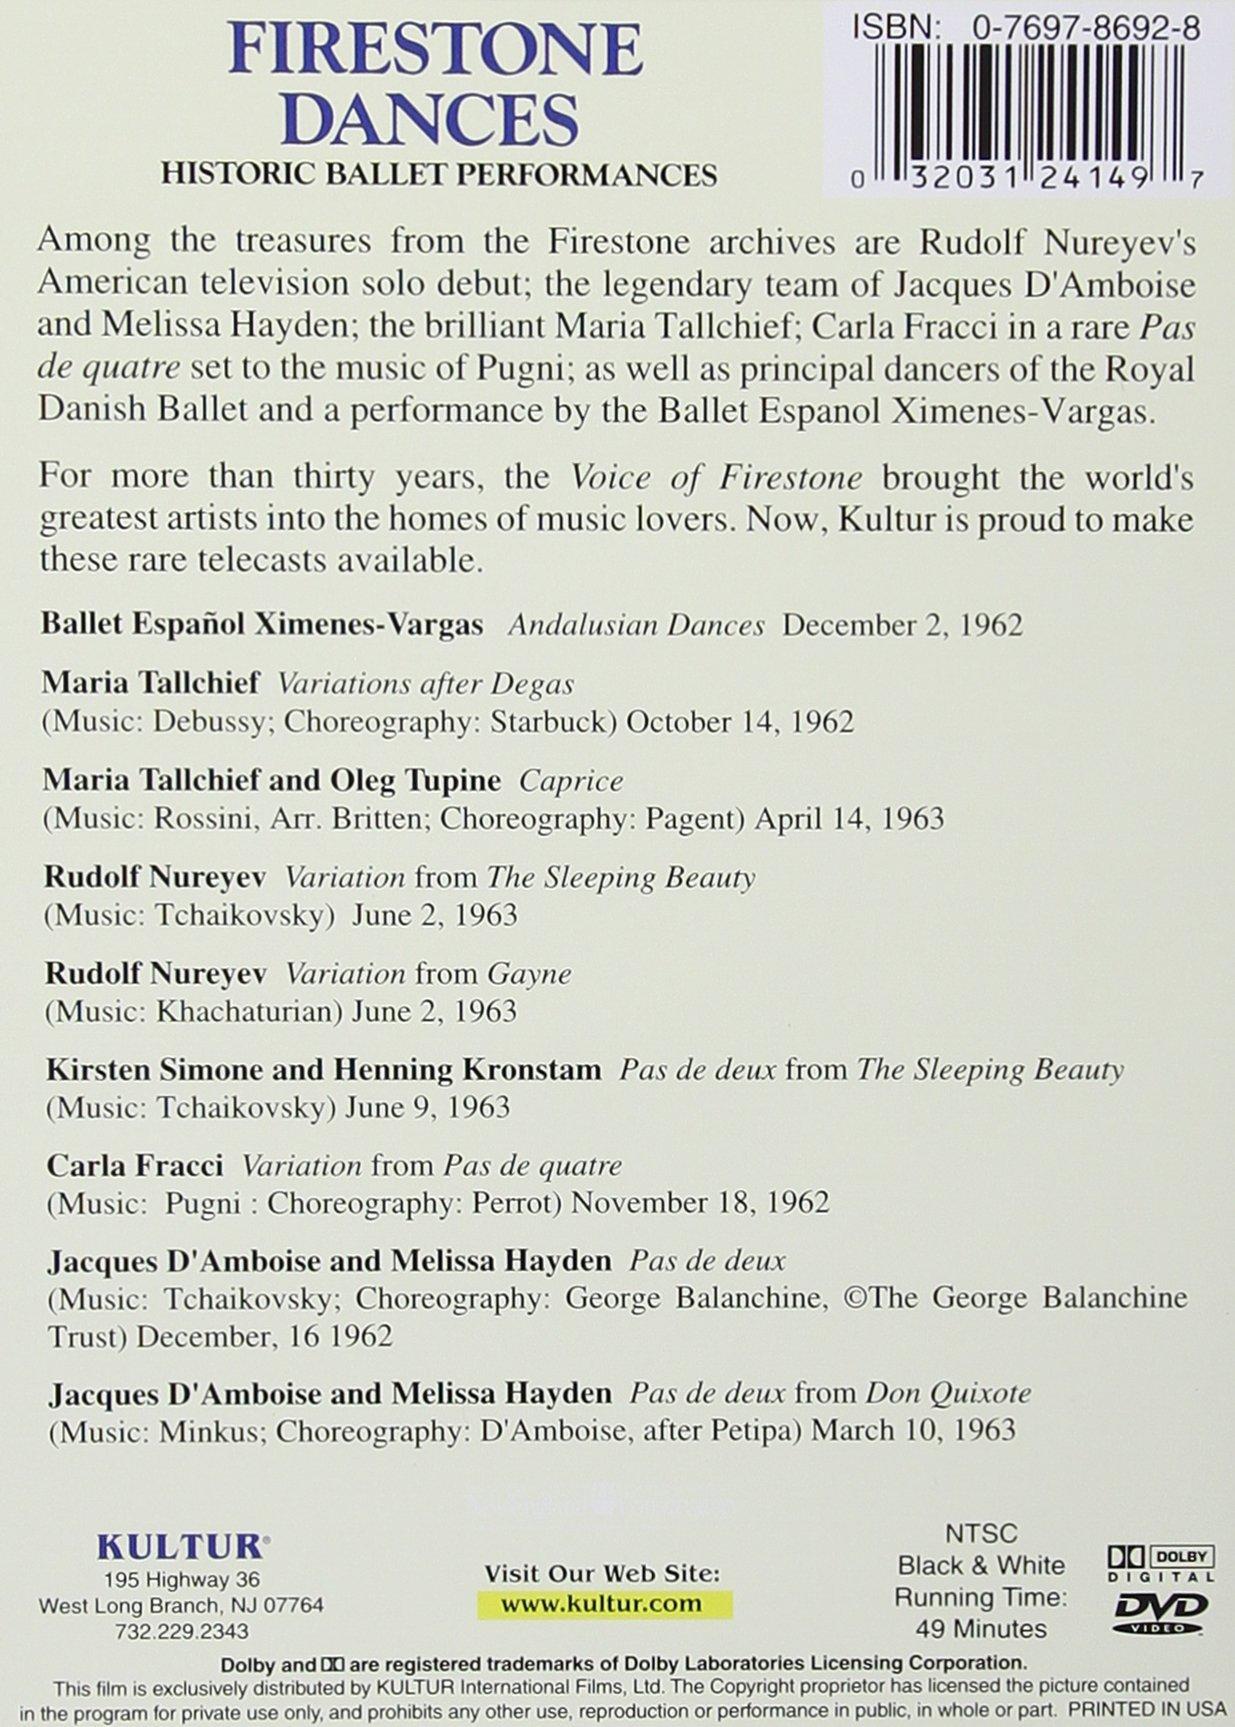 Historic Ballet Performances by Kulter